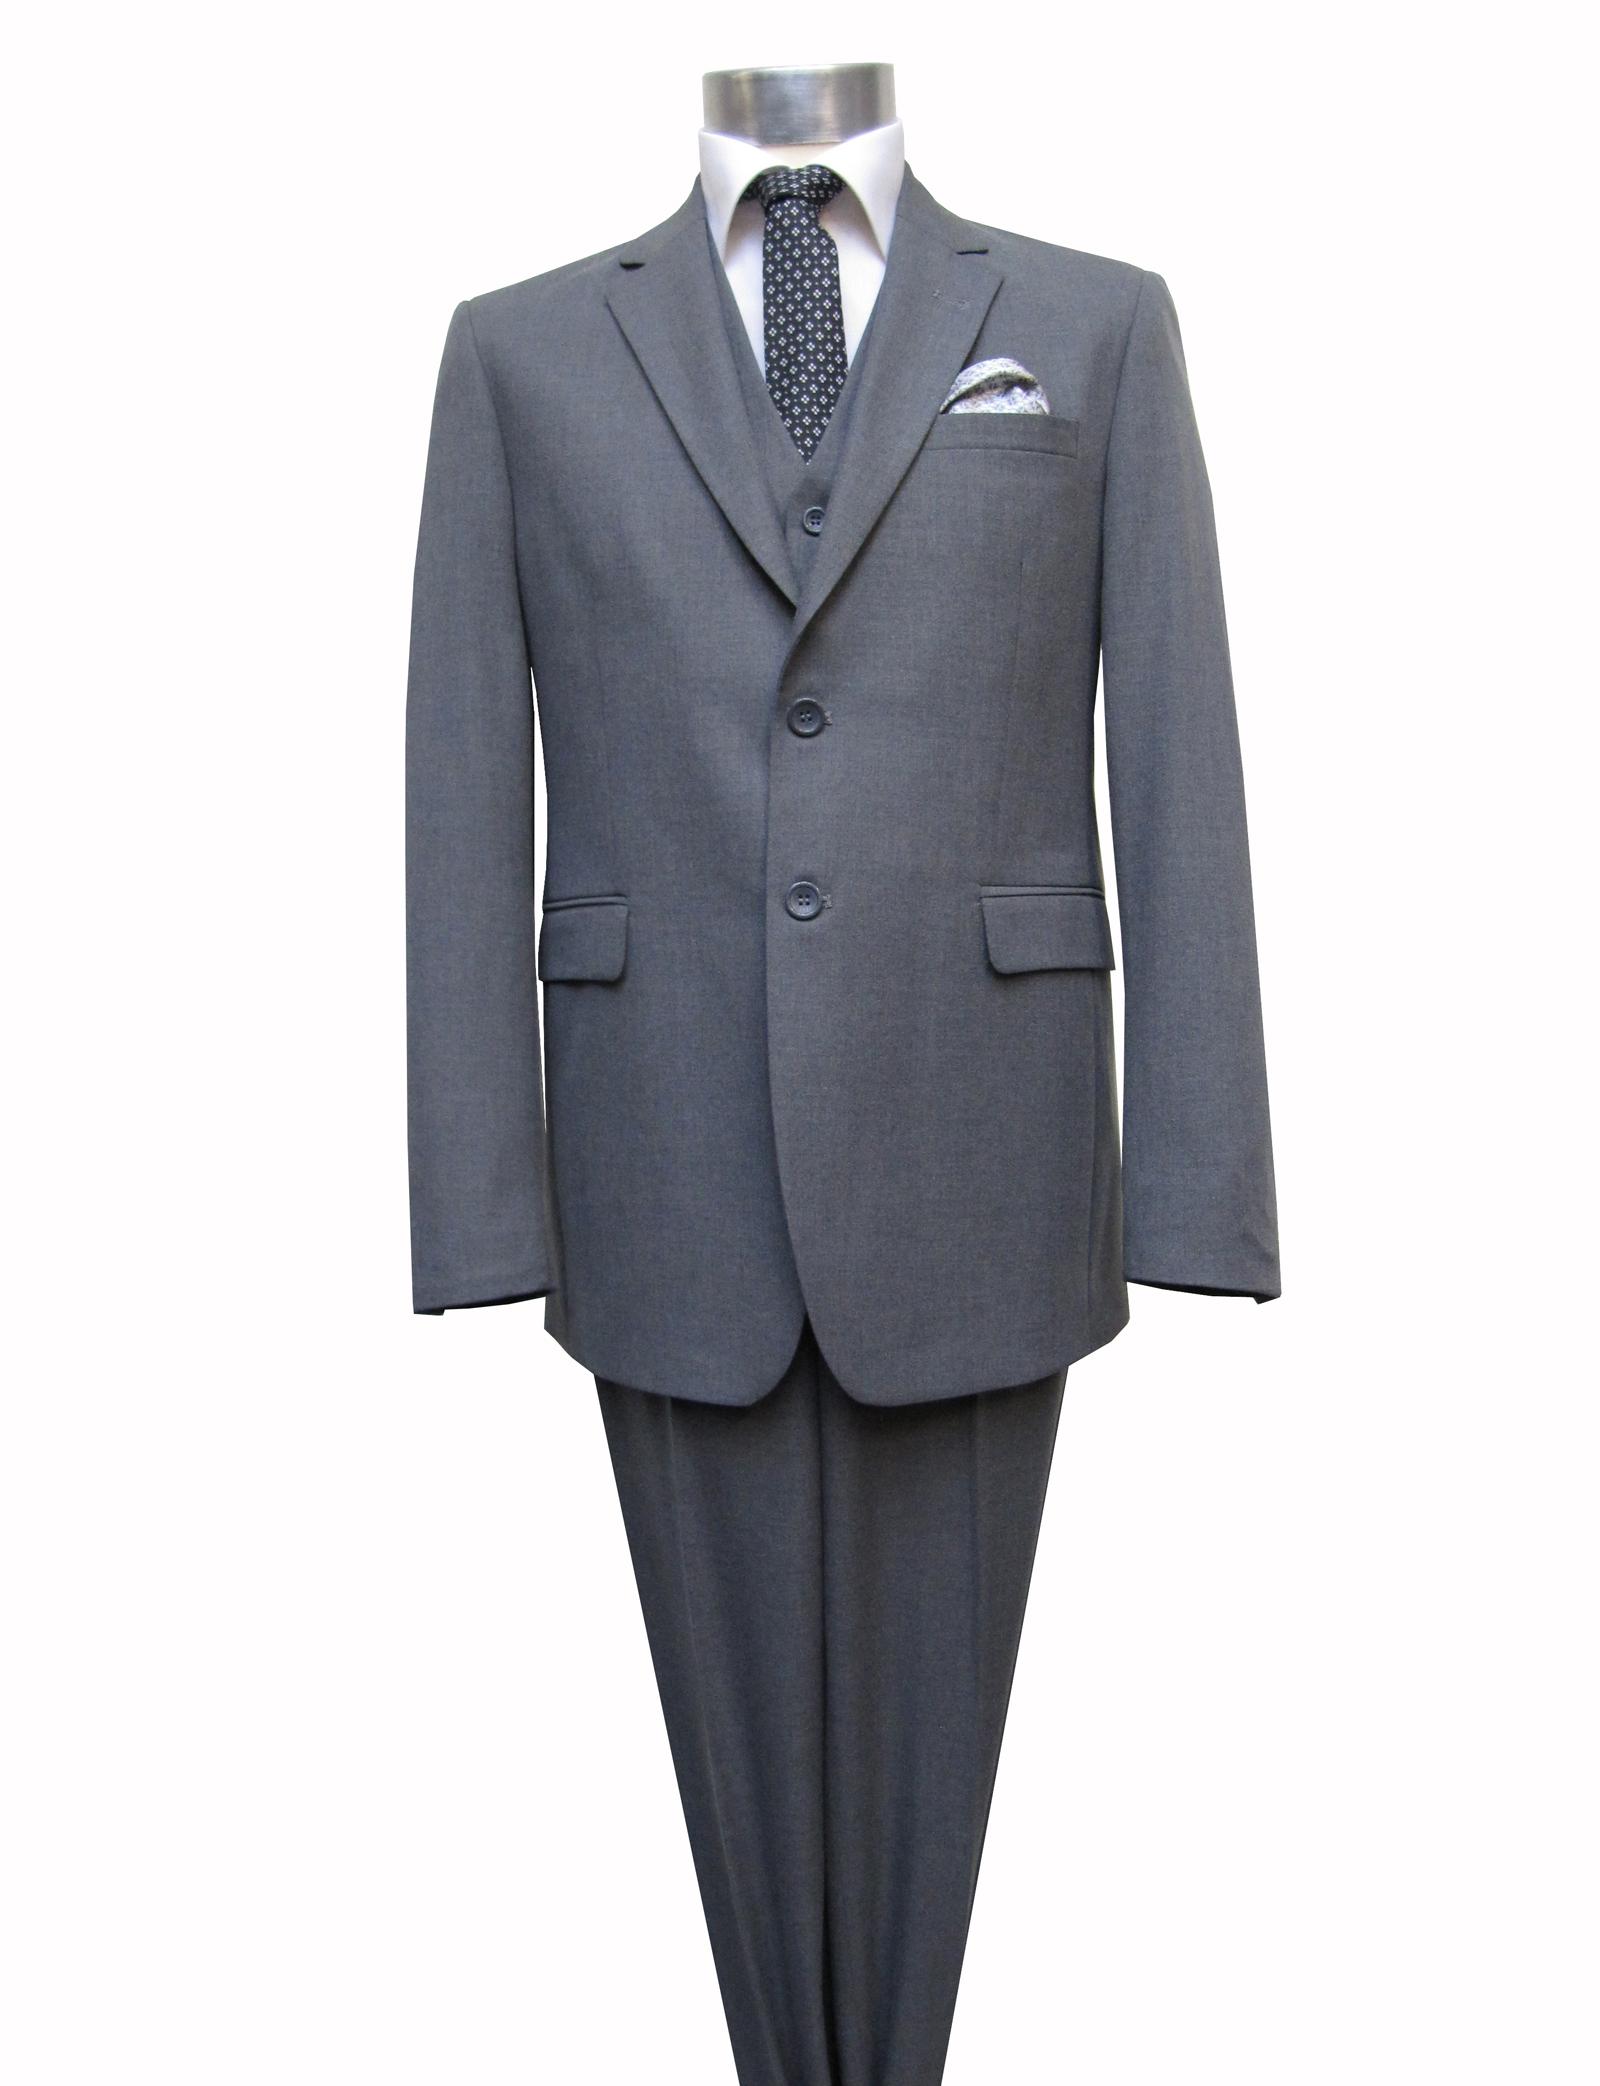 herren anzug mit weste elegant grau ebay. Black Bedroom Furniture Sets. Home Design Ideas